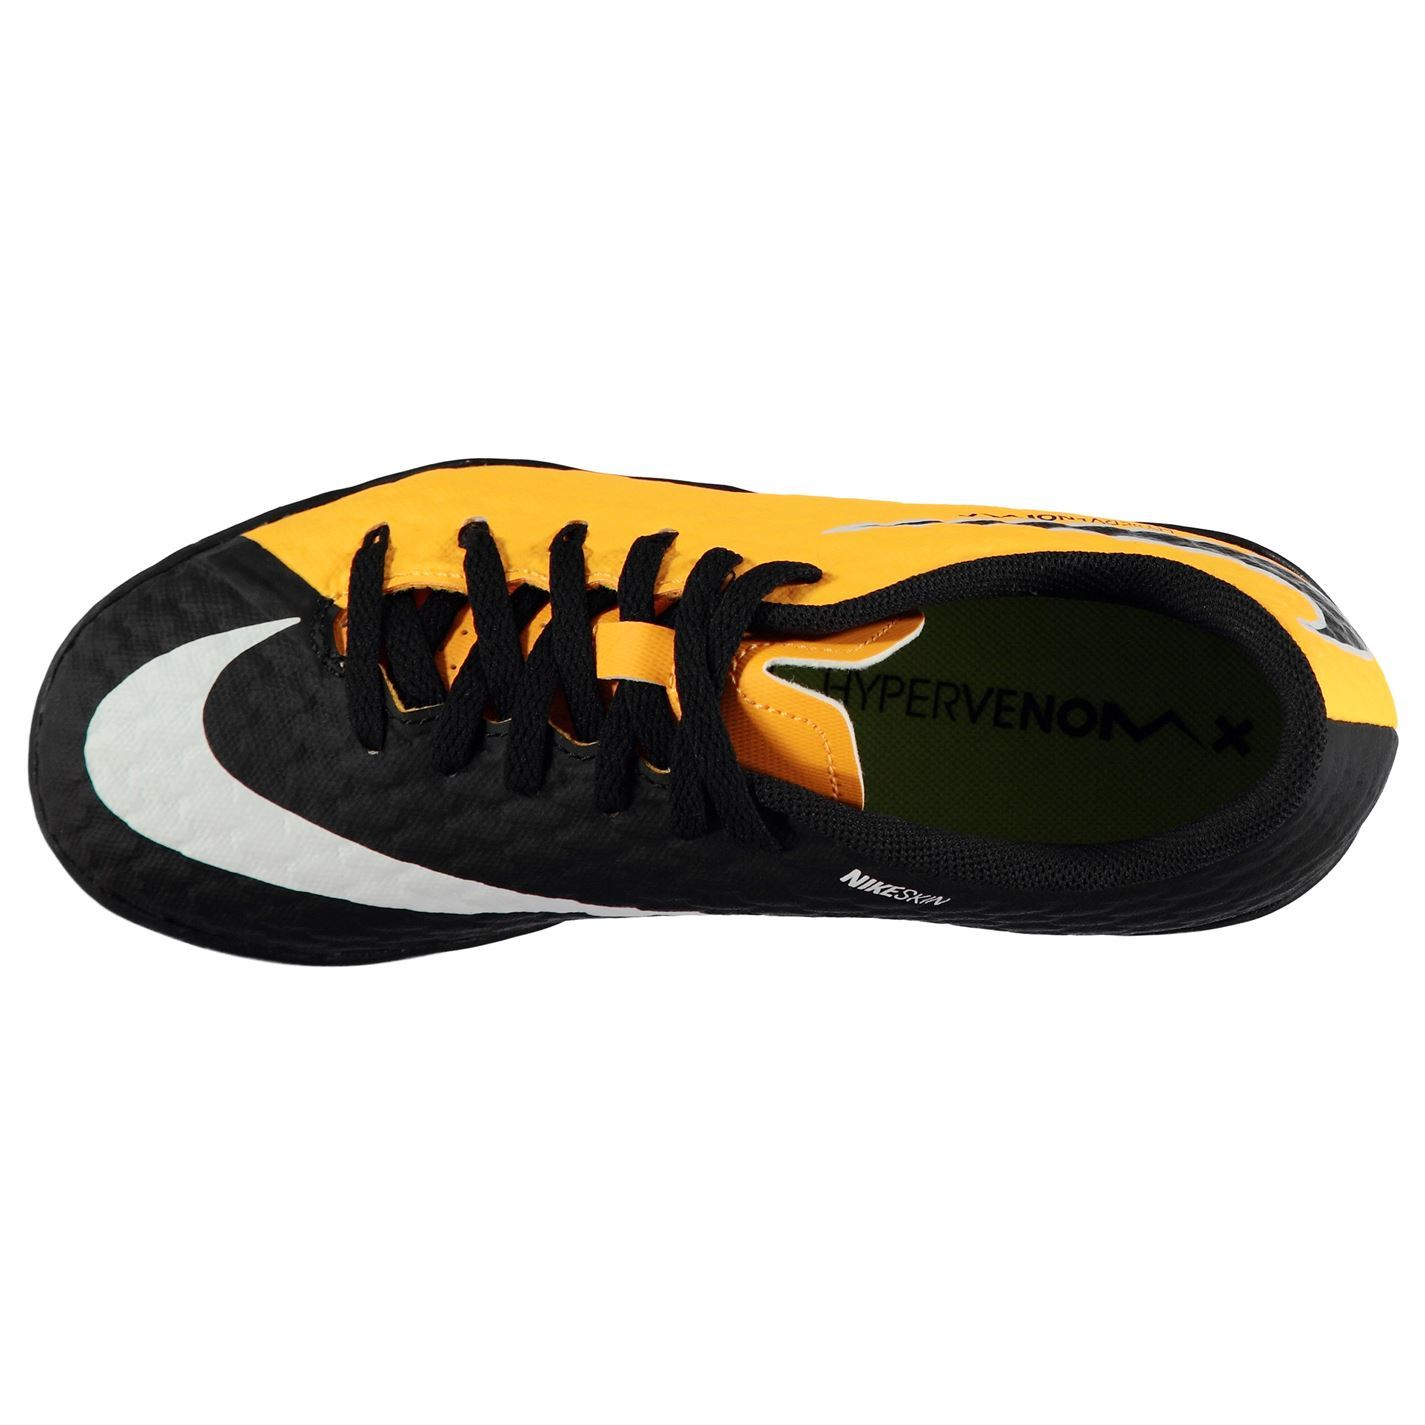 3edede769f0f ... Nike Hypervenom Phelon Astro Turf Football Trainers Juniors Orange  Soccer Shoes